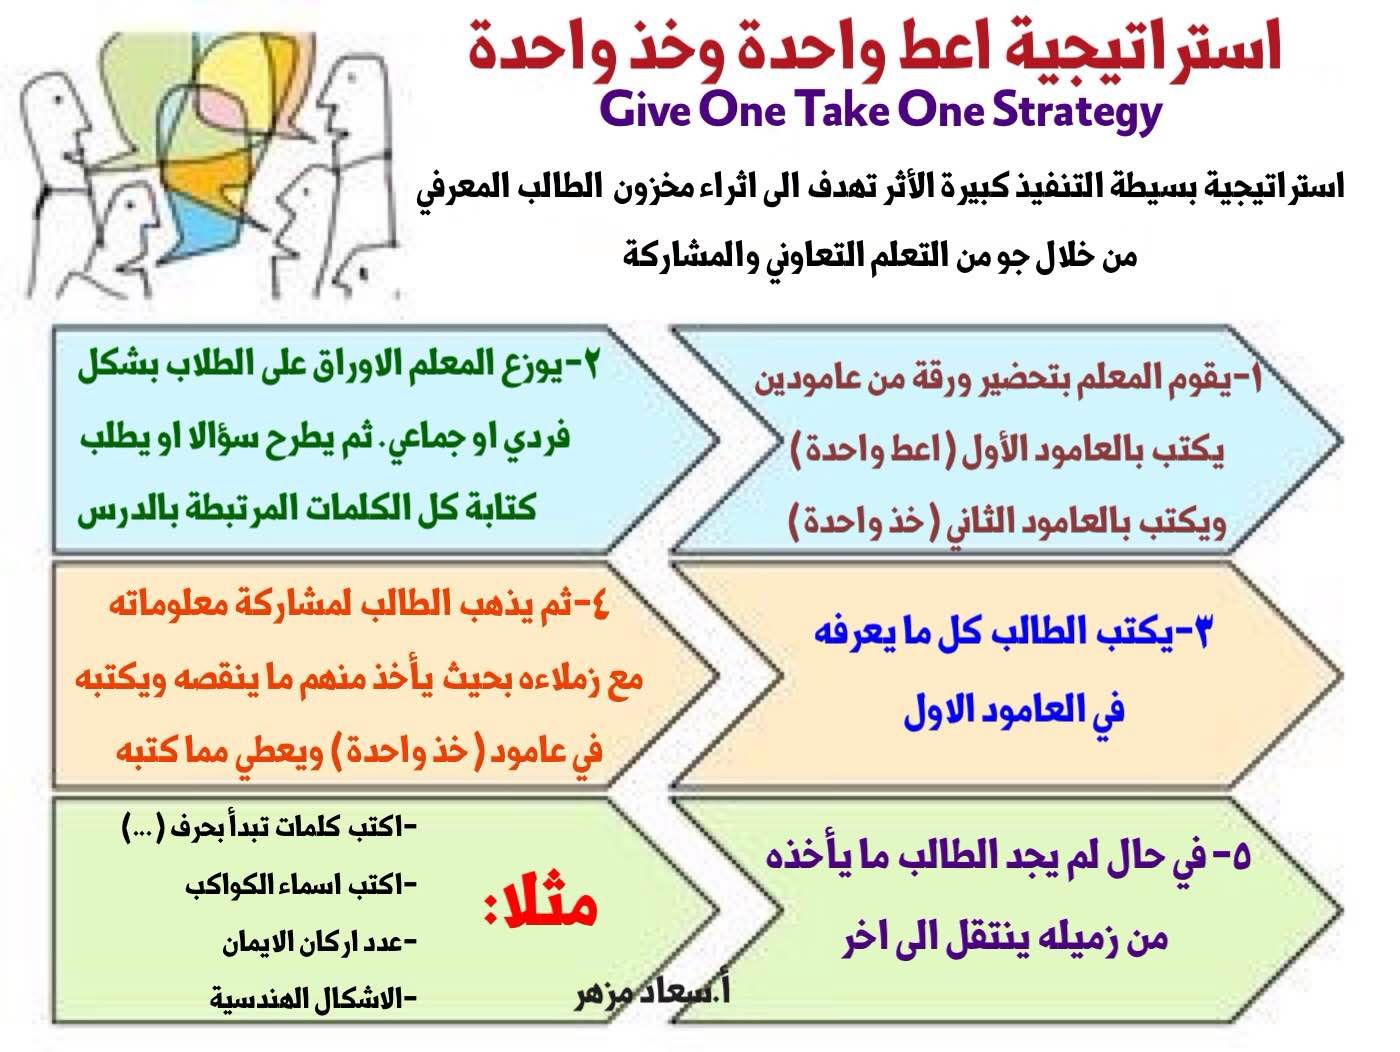 Higher Order Of Thinking Strategies استراتيجيات التفكير العليا 3ilm Nafi3 Learning Arabic Active Learning Strategies Learning Strategies